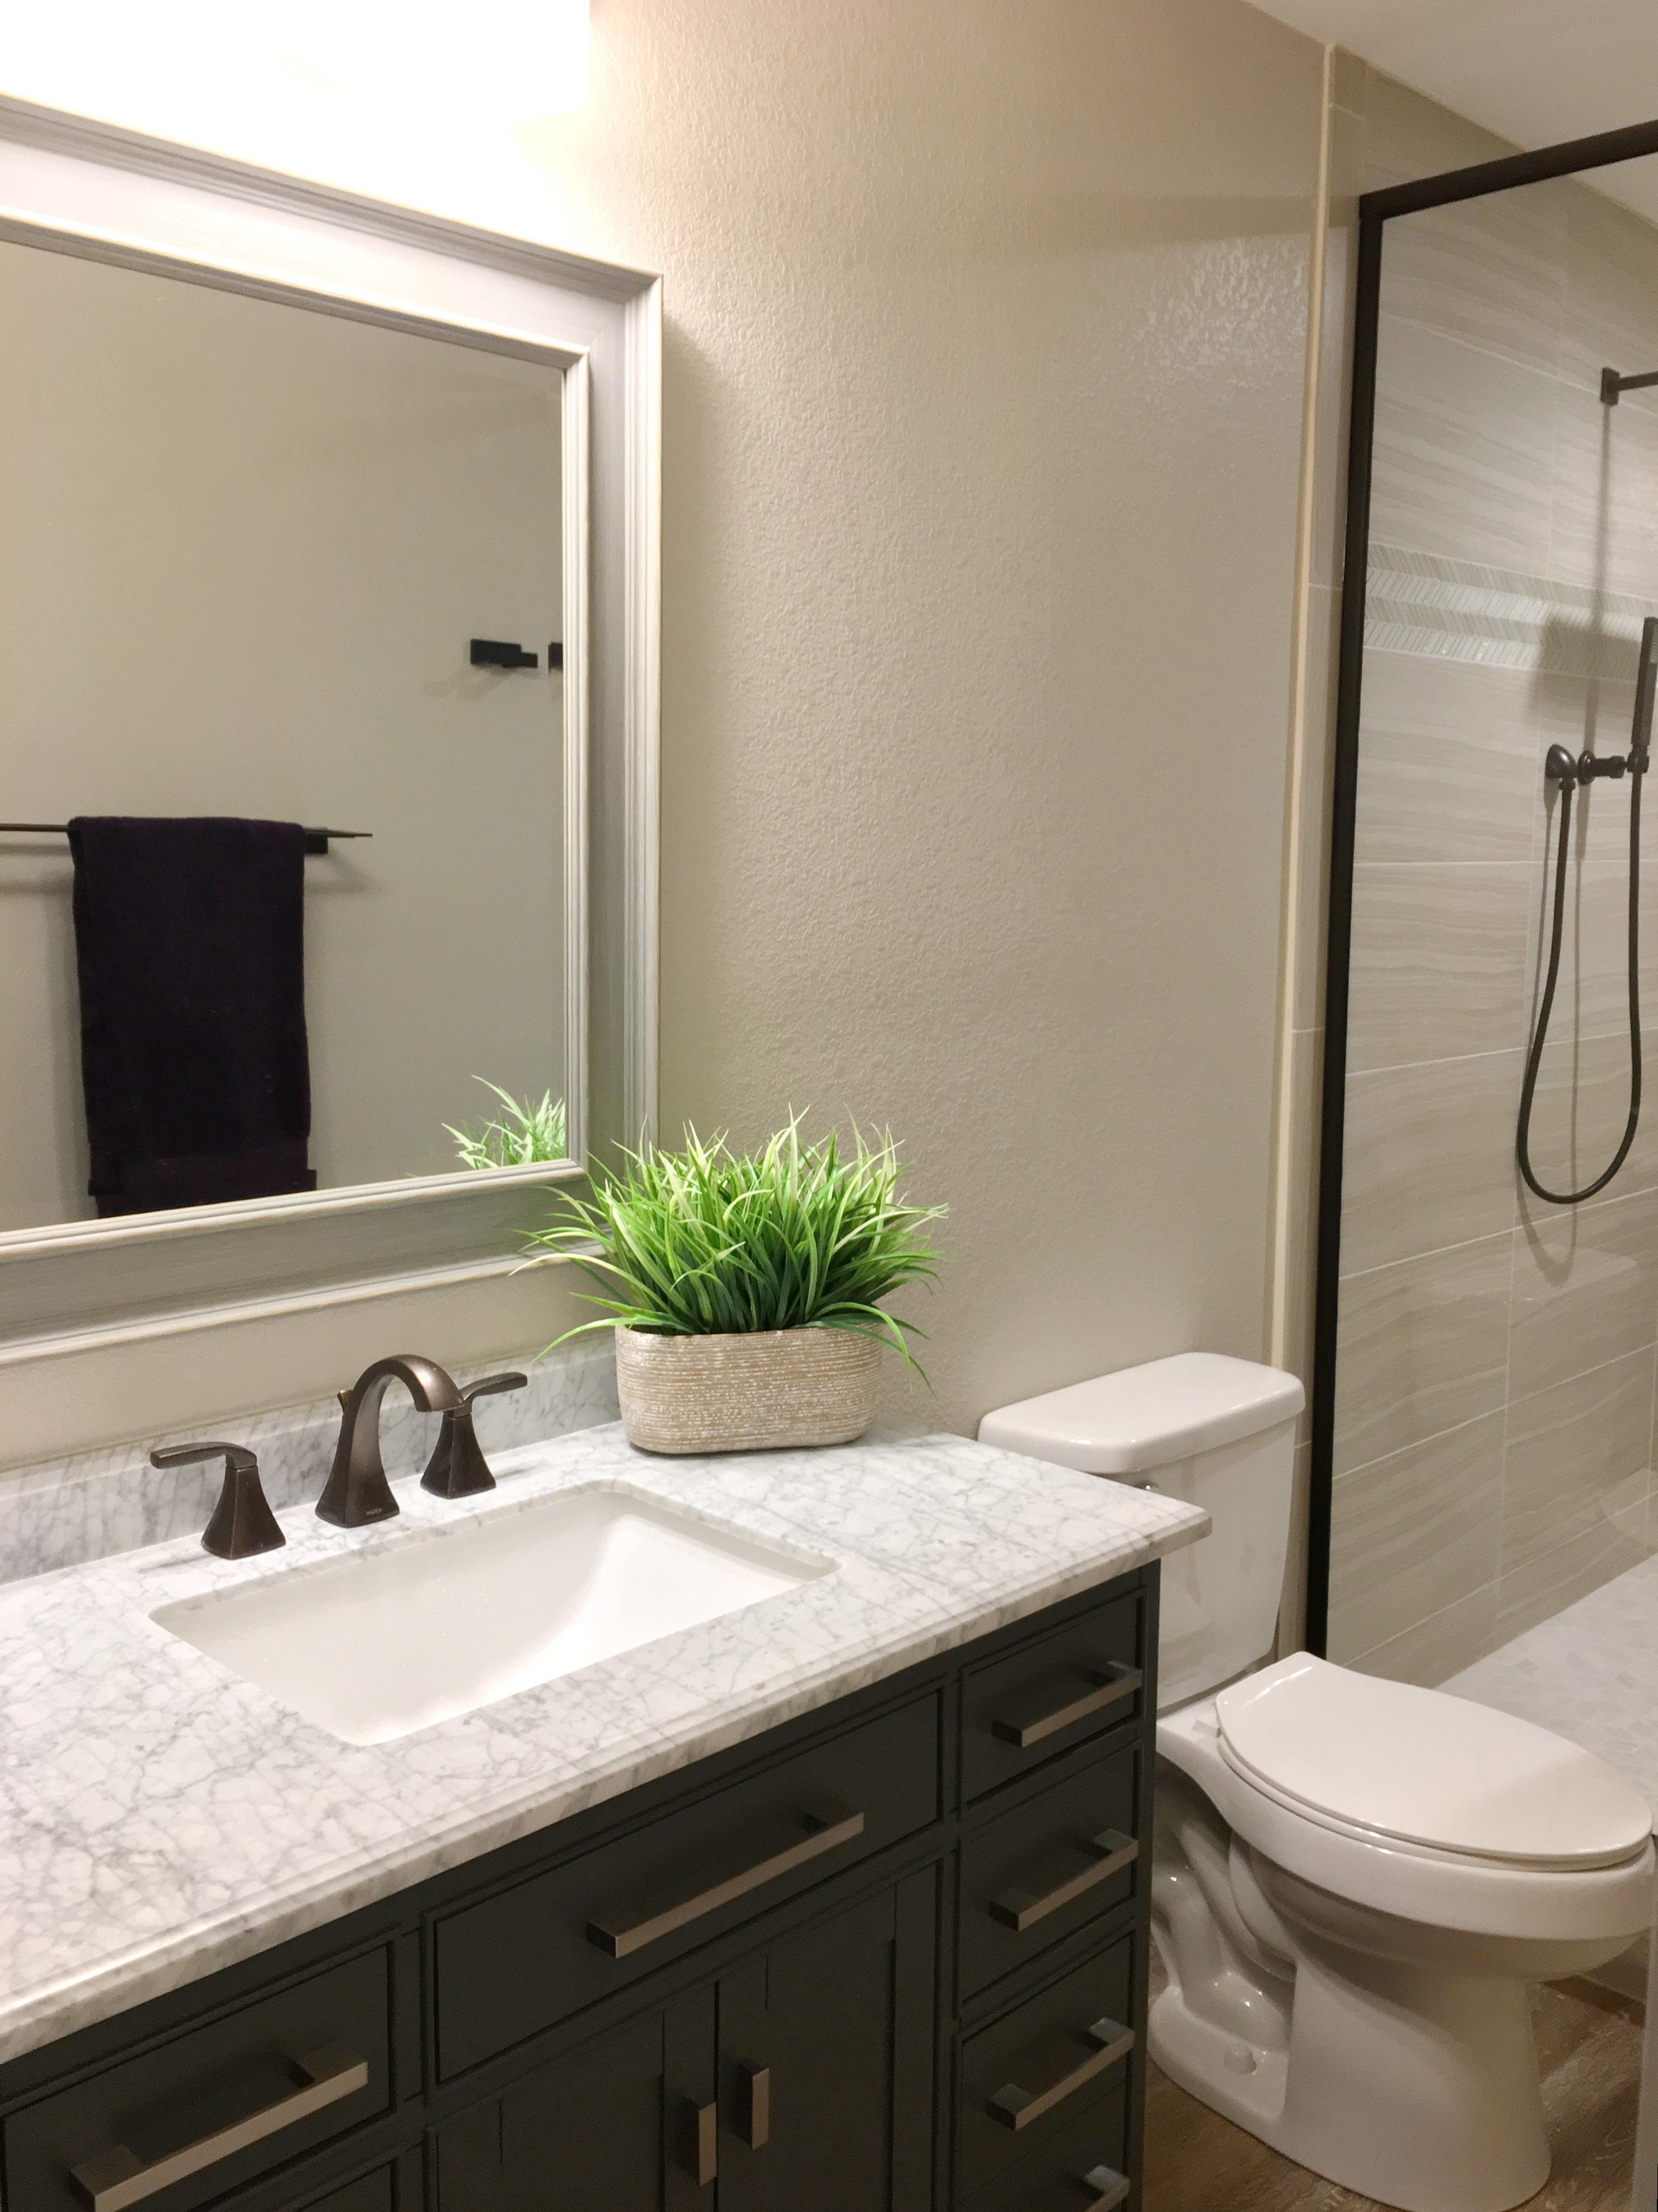 Bathroom complete